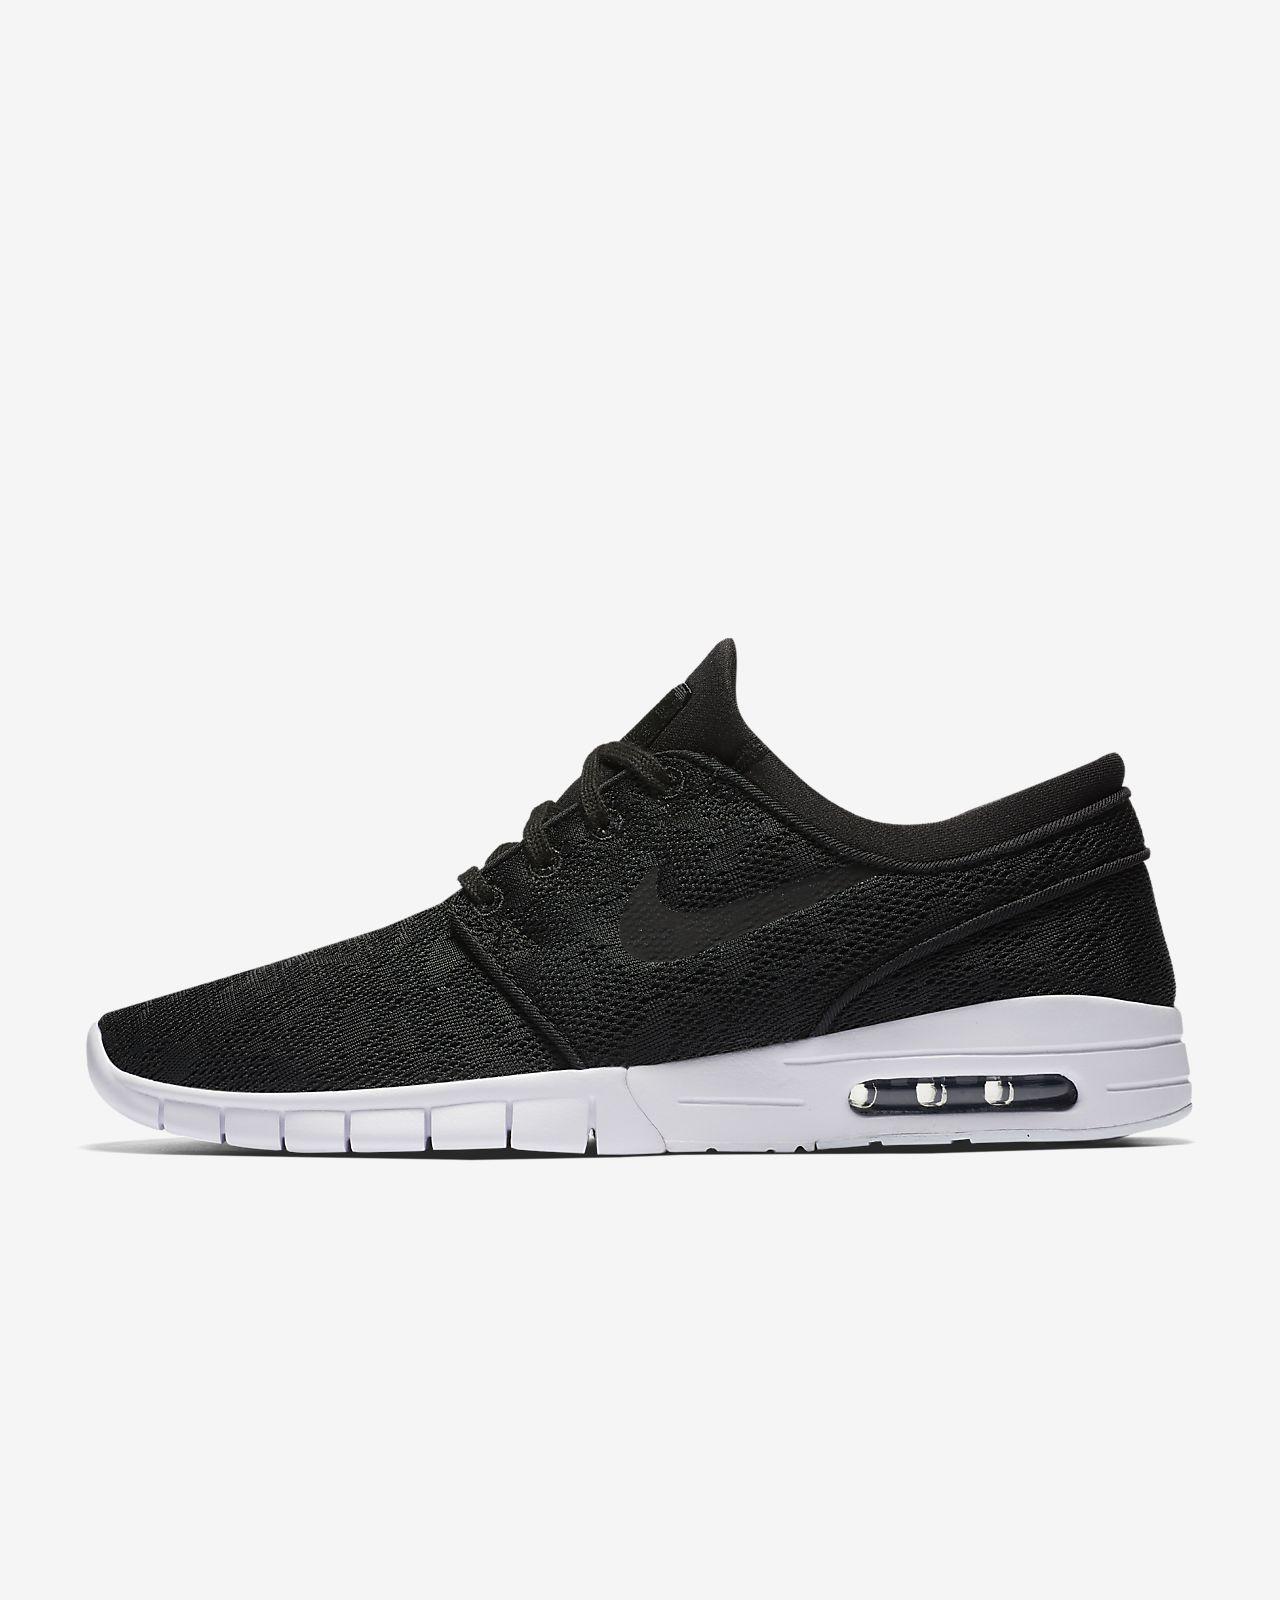 80a853cd871a Nike SB Stefan Janoski Max Skate Shoe. Nike.com LU